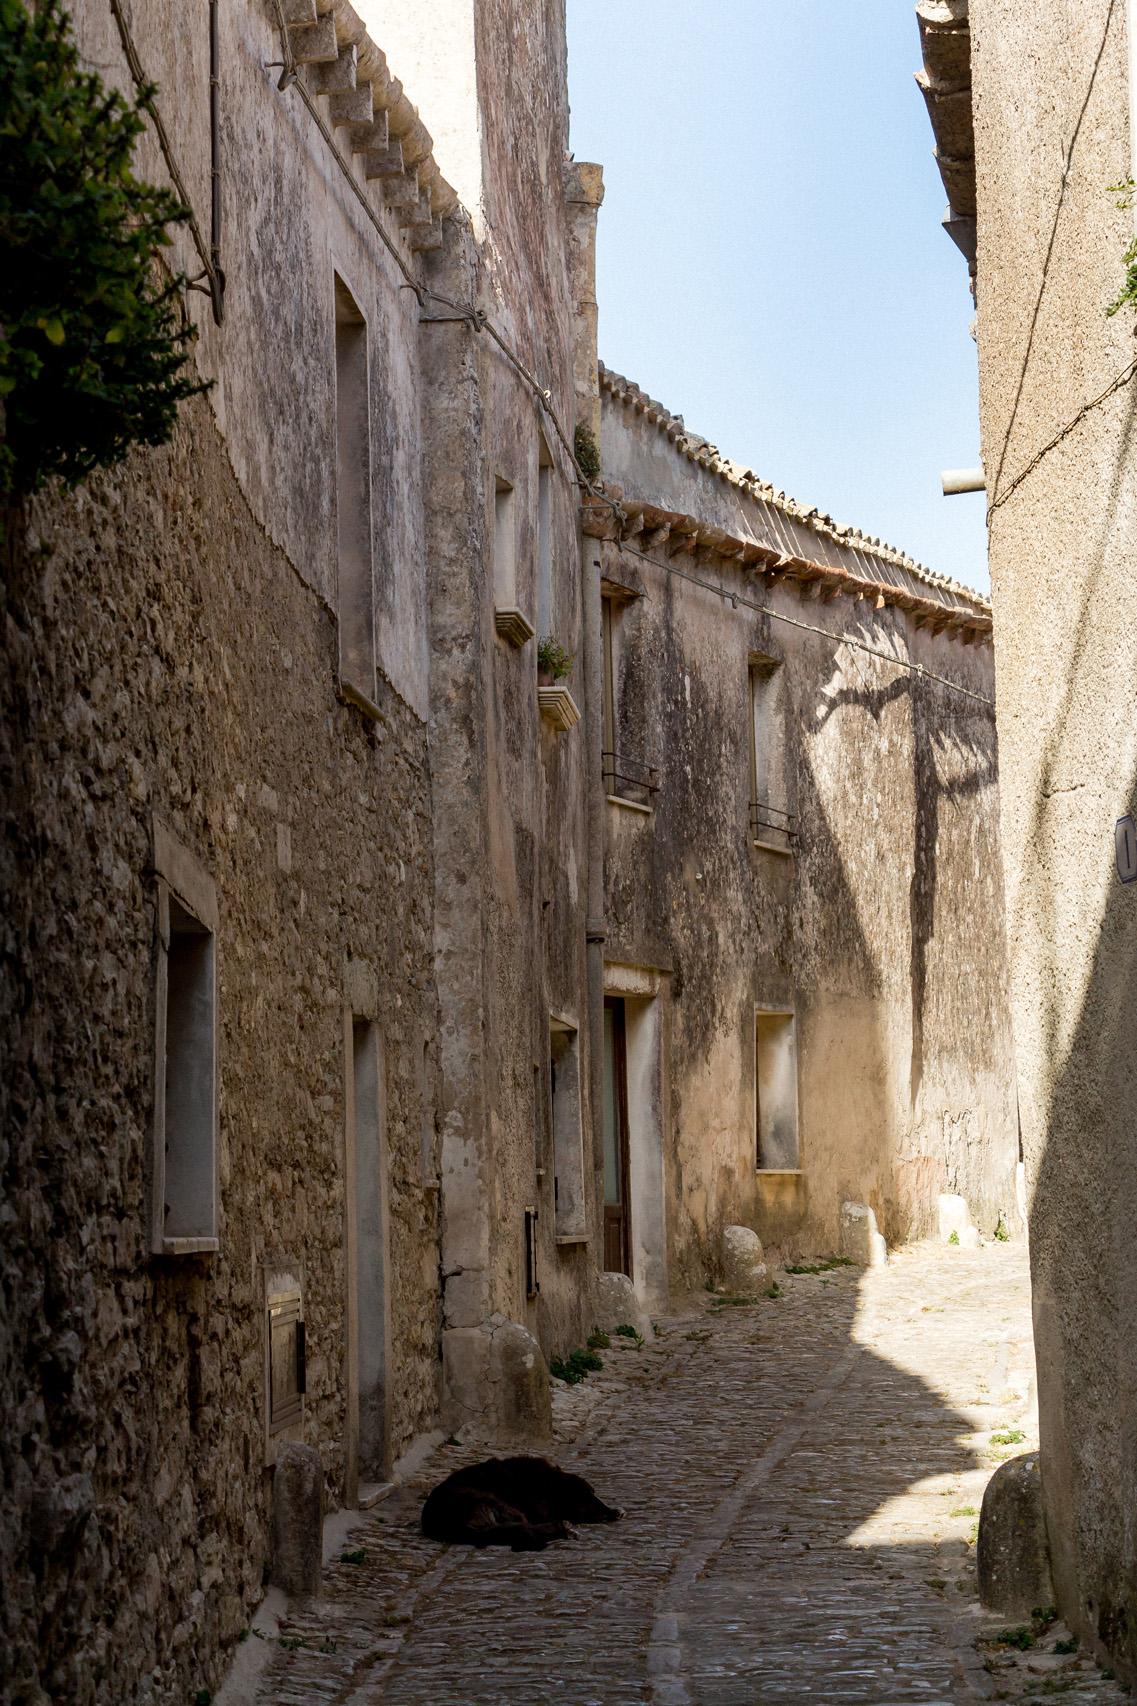 Streets of Erice, Sicily